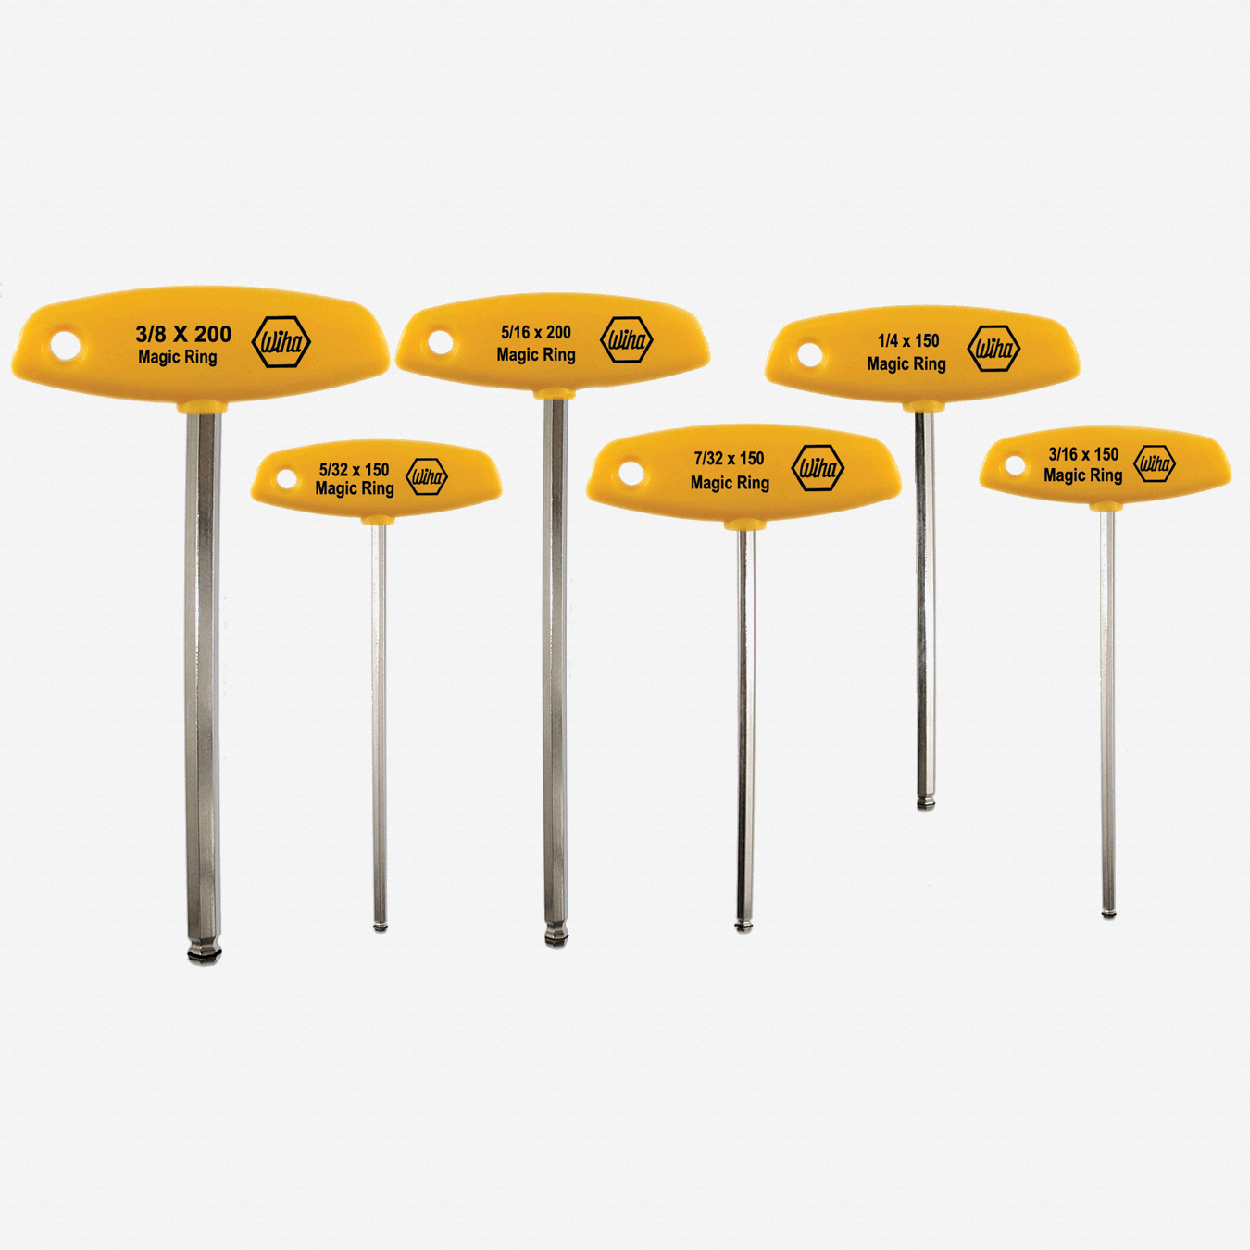 Wiha 54091 6 Piece MagicRing Ball End Hex SAE T-handle Set - KC Tool